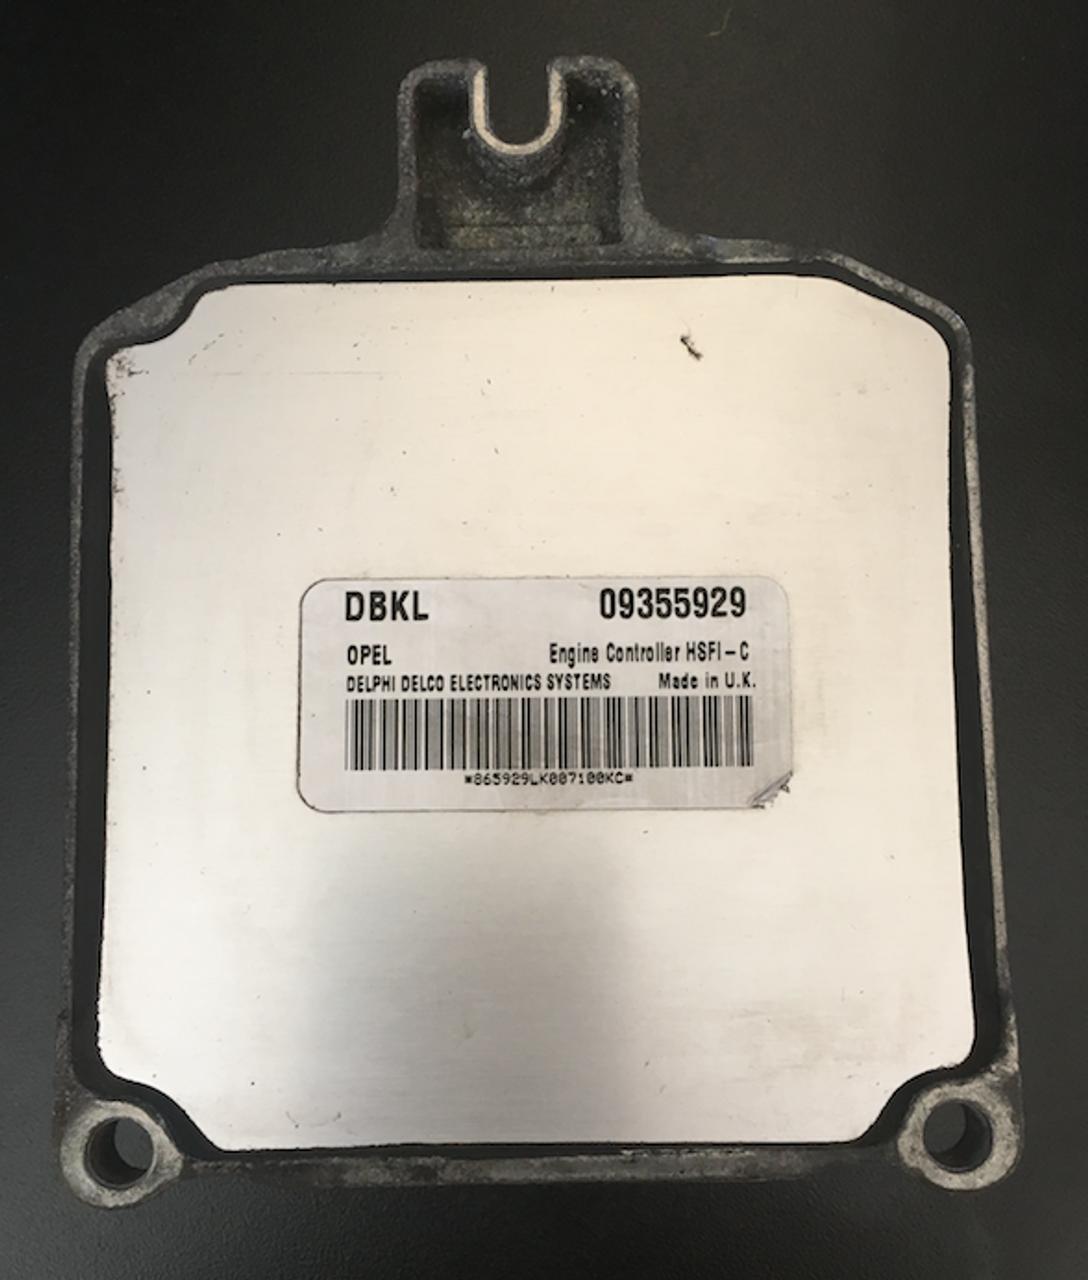 Vauxhall, 09355929,DBKL, HSFI-C